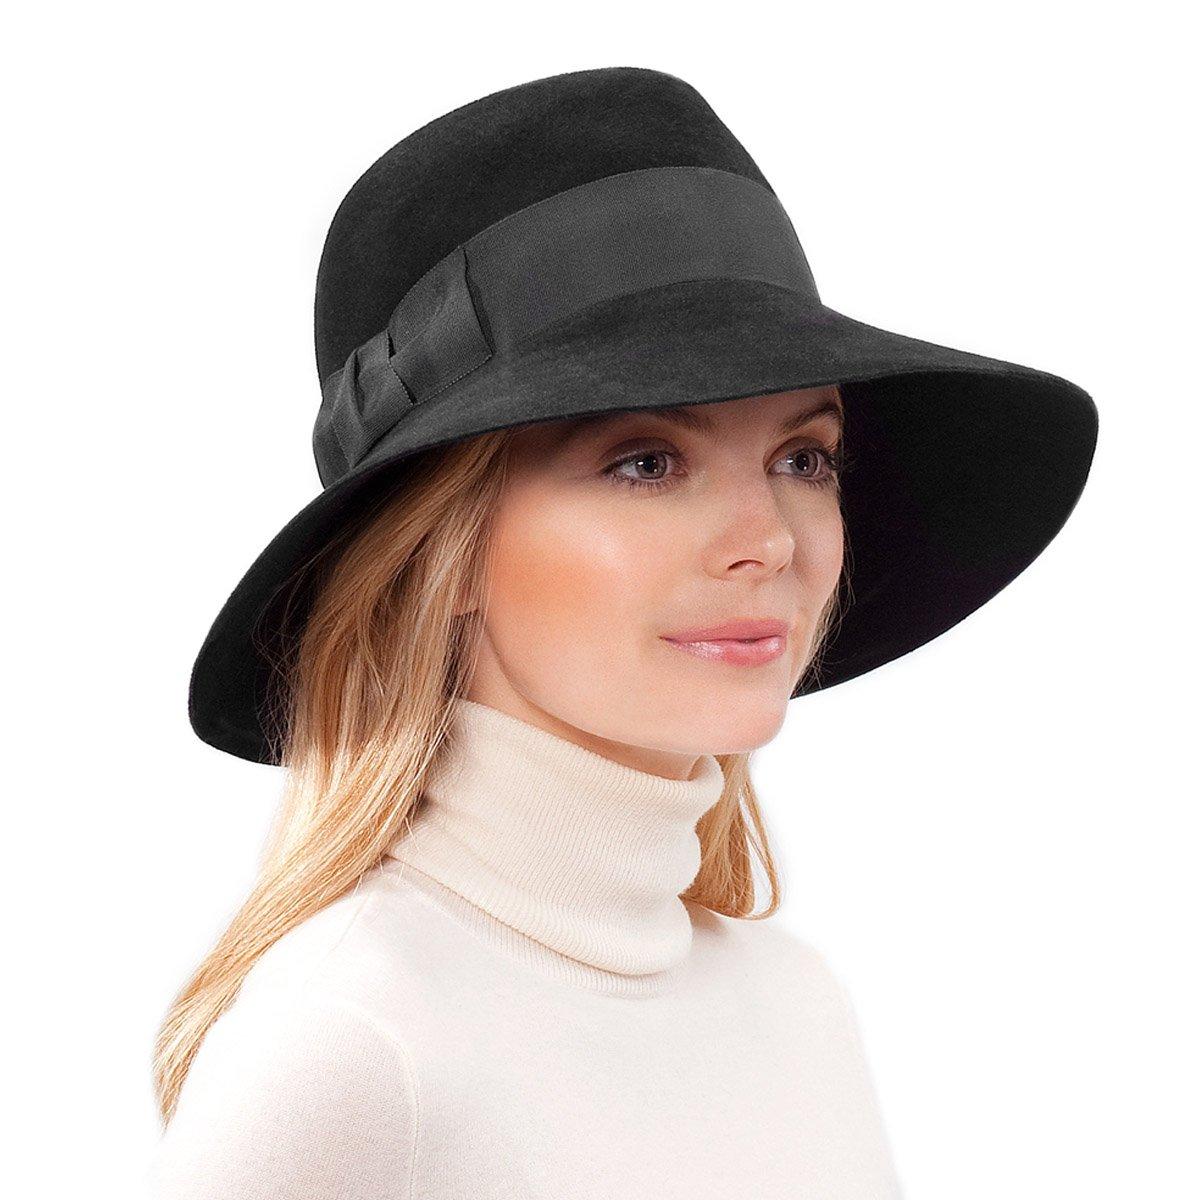 Eric Javits Luxury Fashion Designer Women's Headwear Hat - Tiffany - Black by Eric Javits